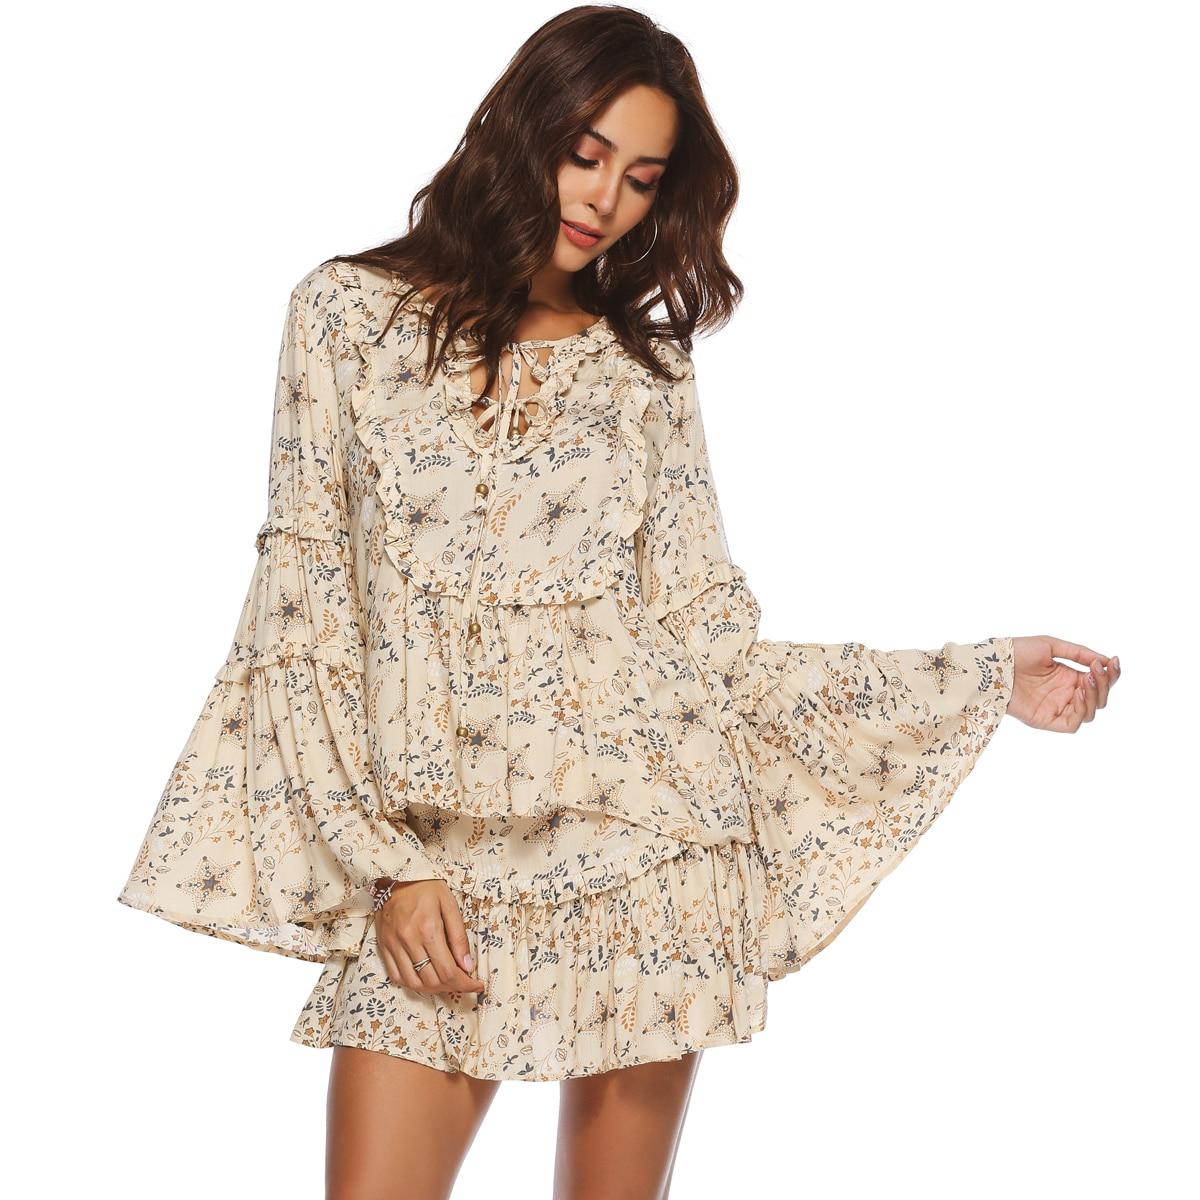 c8b4977784884 Buy boho gypsie blouse and get free shipping on AliExpress.com